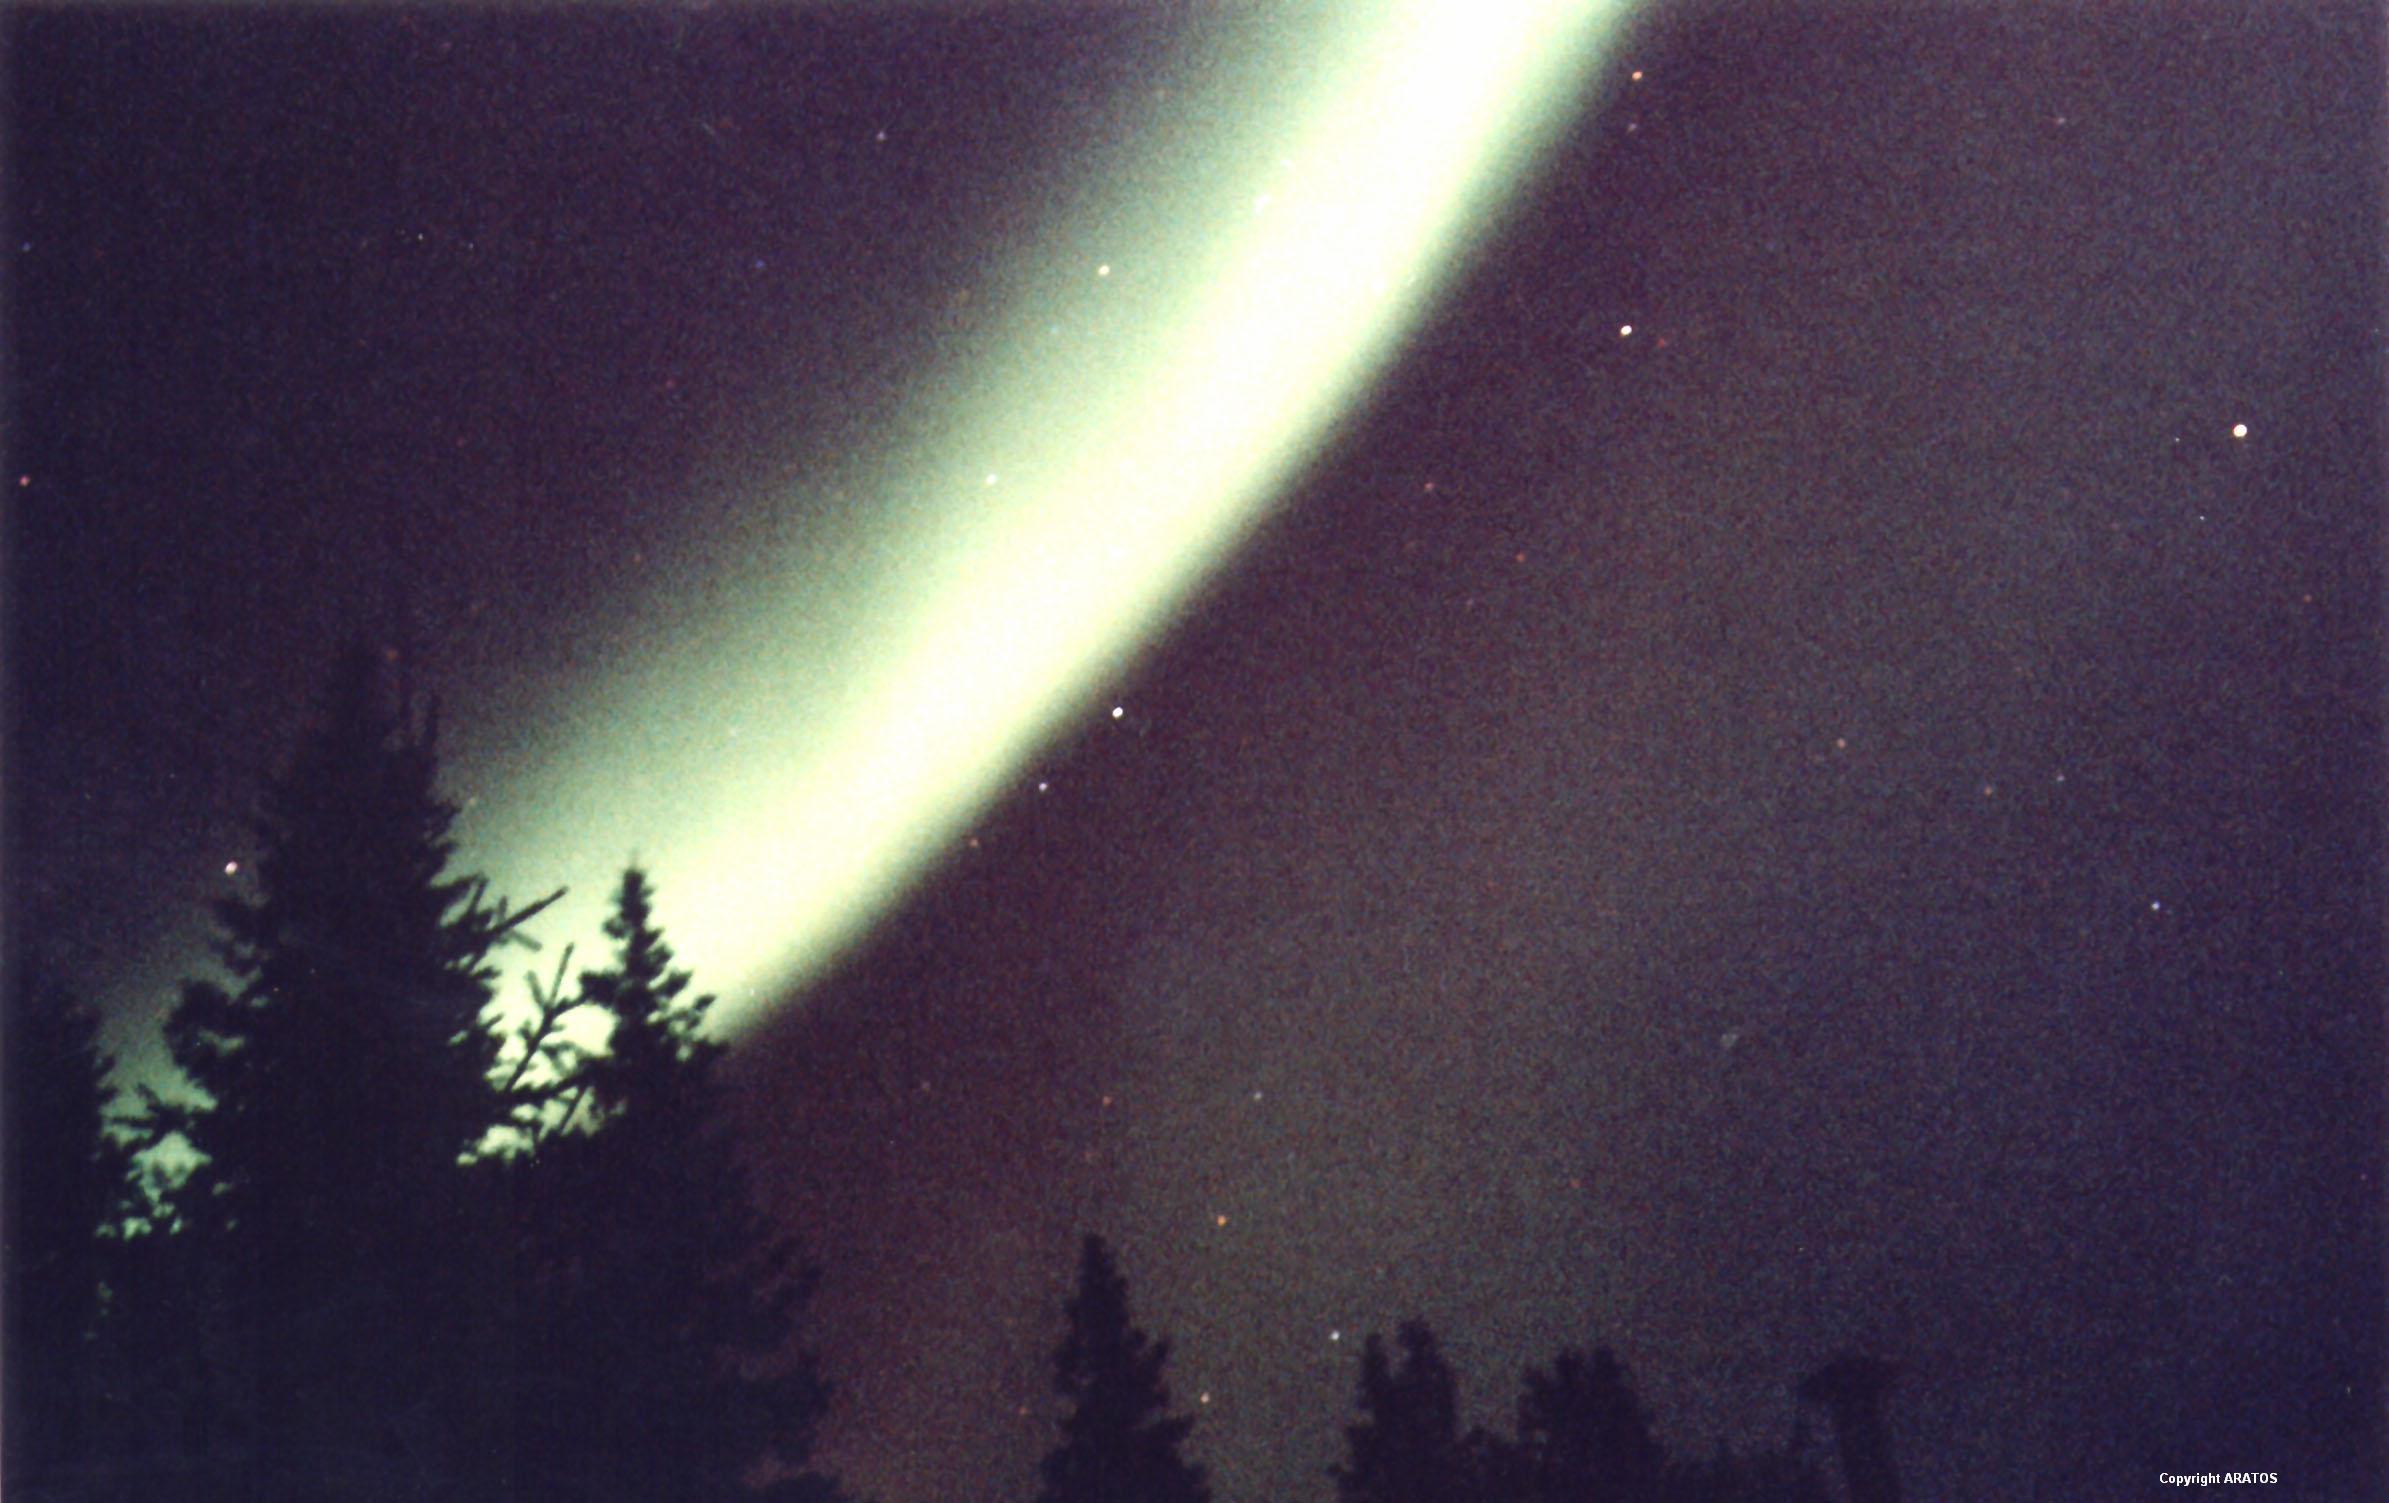 Nordlicht - Aurora Borealis